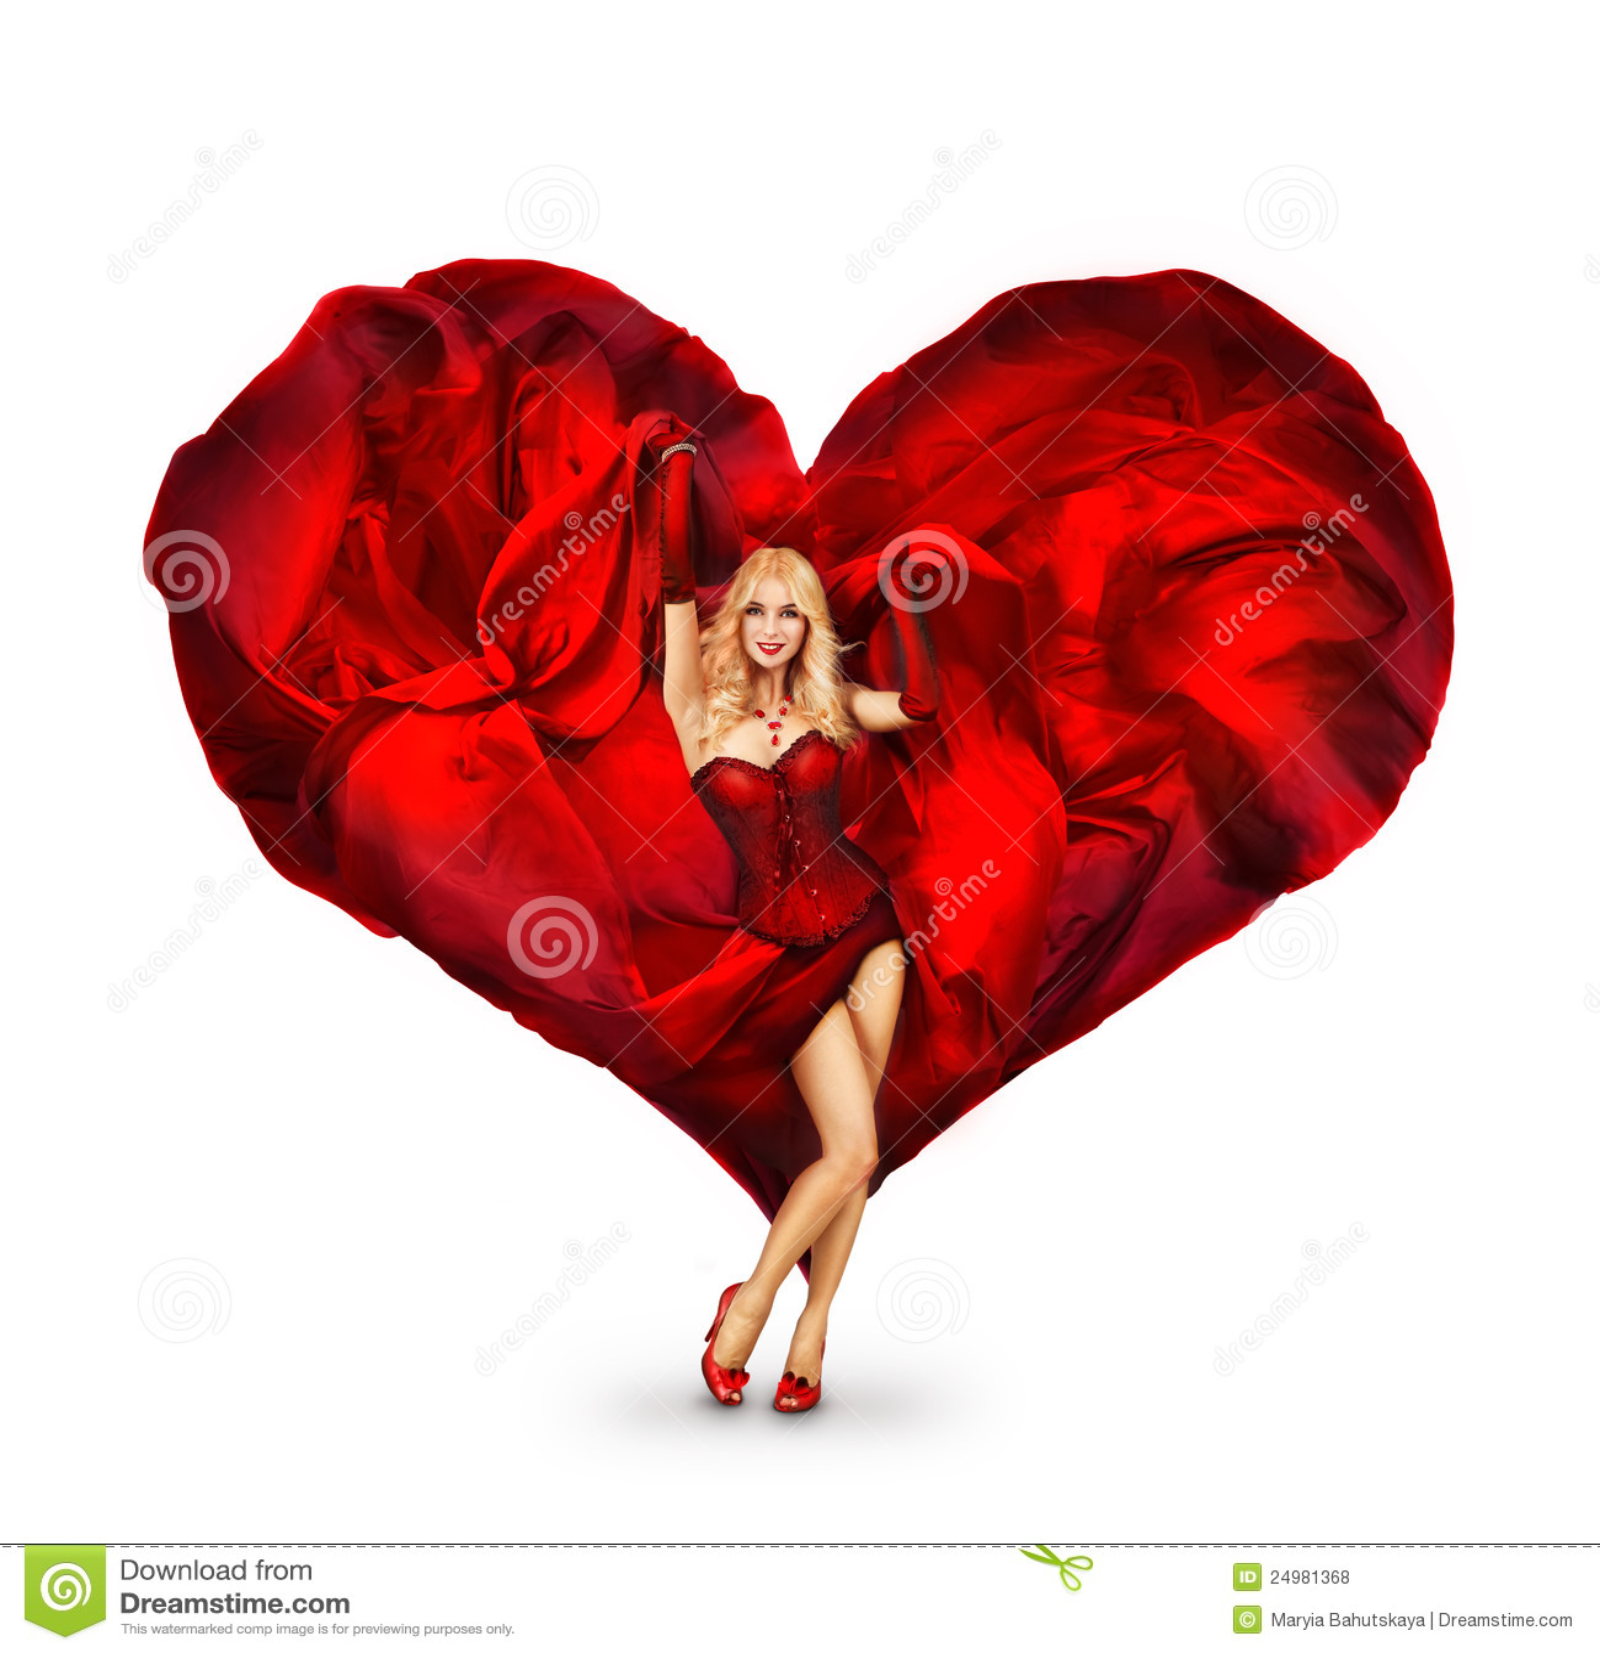 Ding, ding, ding, dong..!!!! Reina-de-corazones-24981368